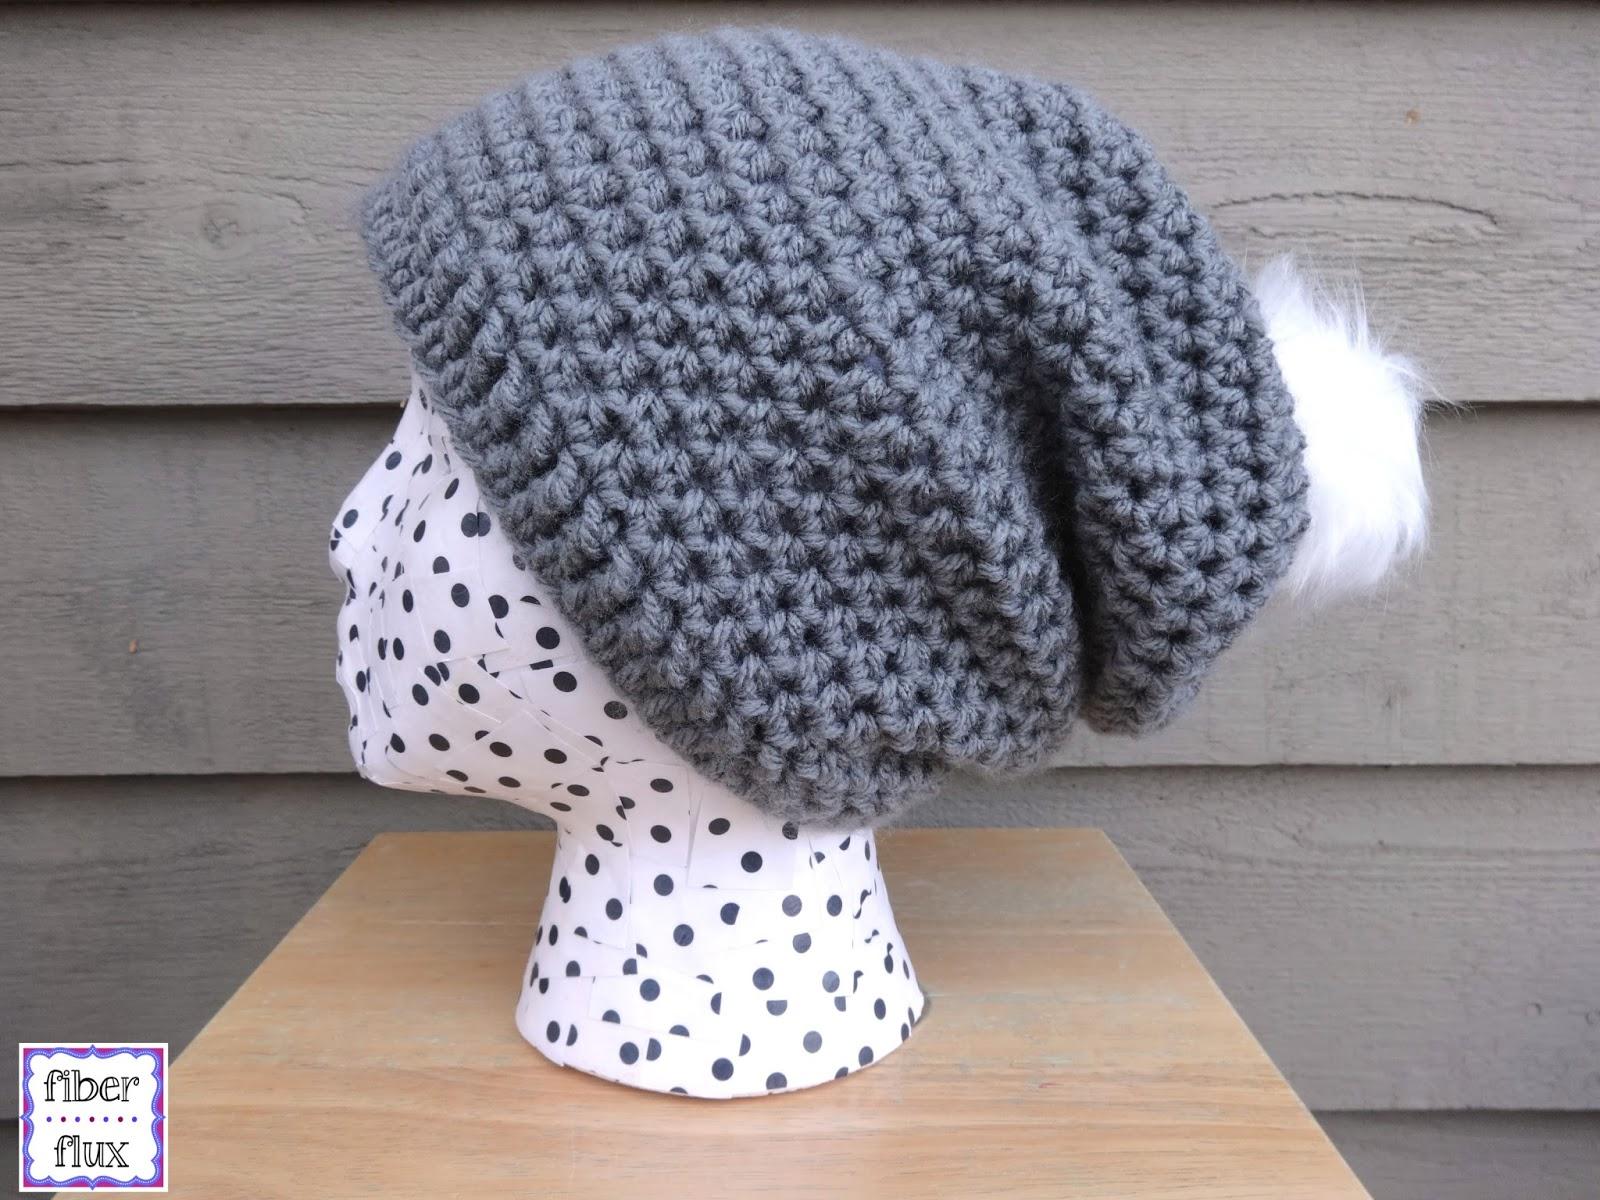 Fiber Flux  Free Crochet Pattern...Cottontail Slouch! 7f93355c2593